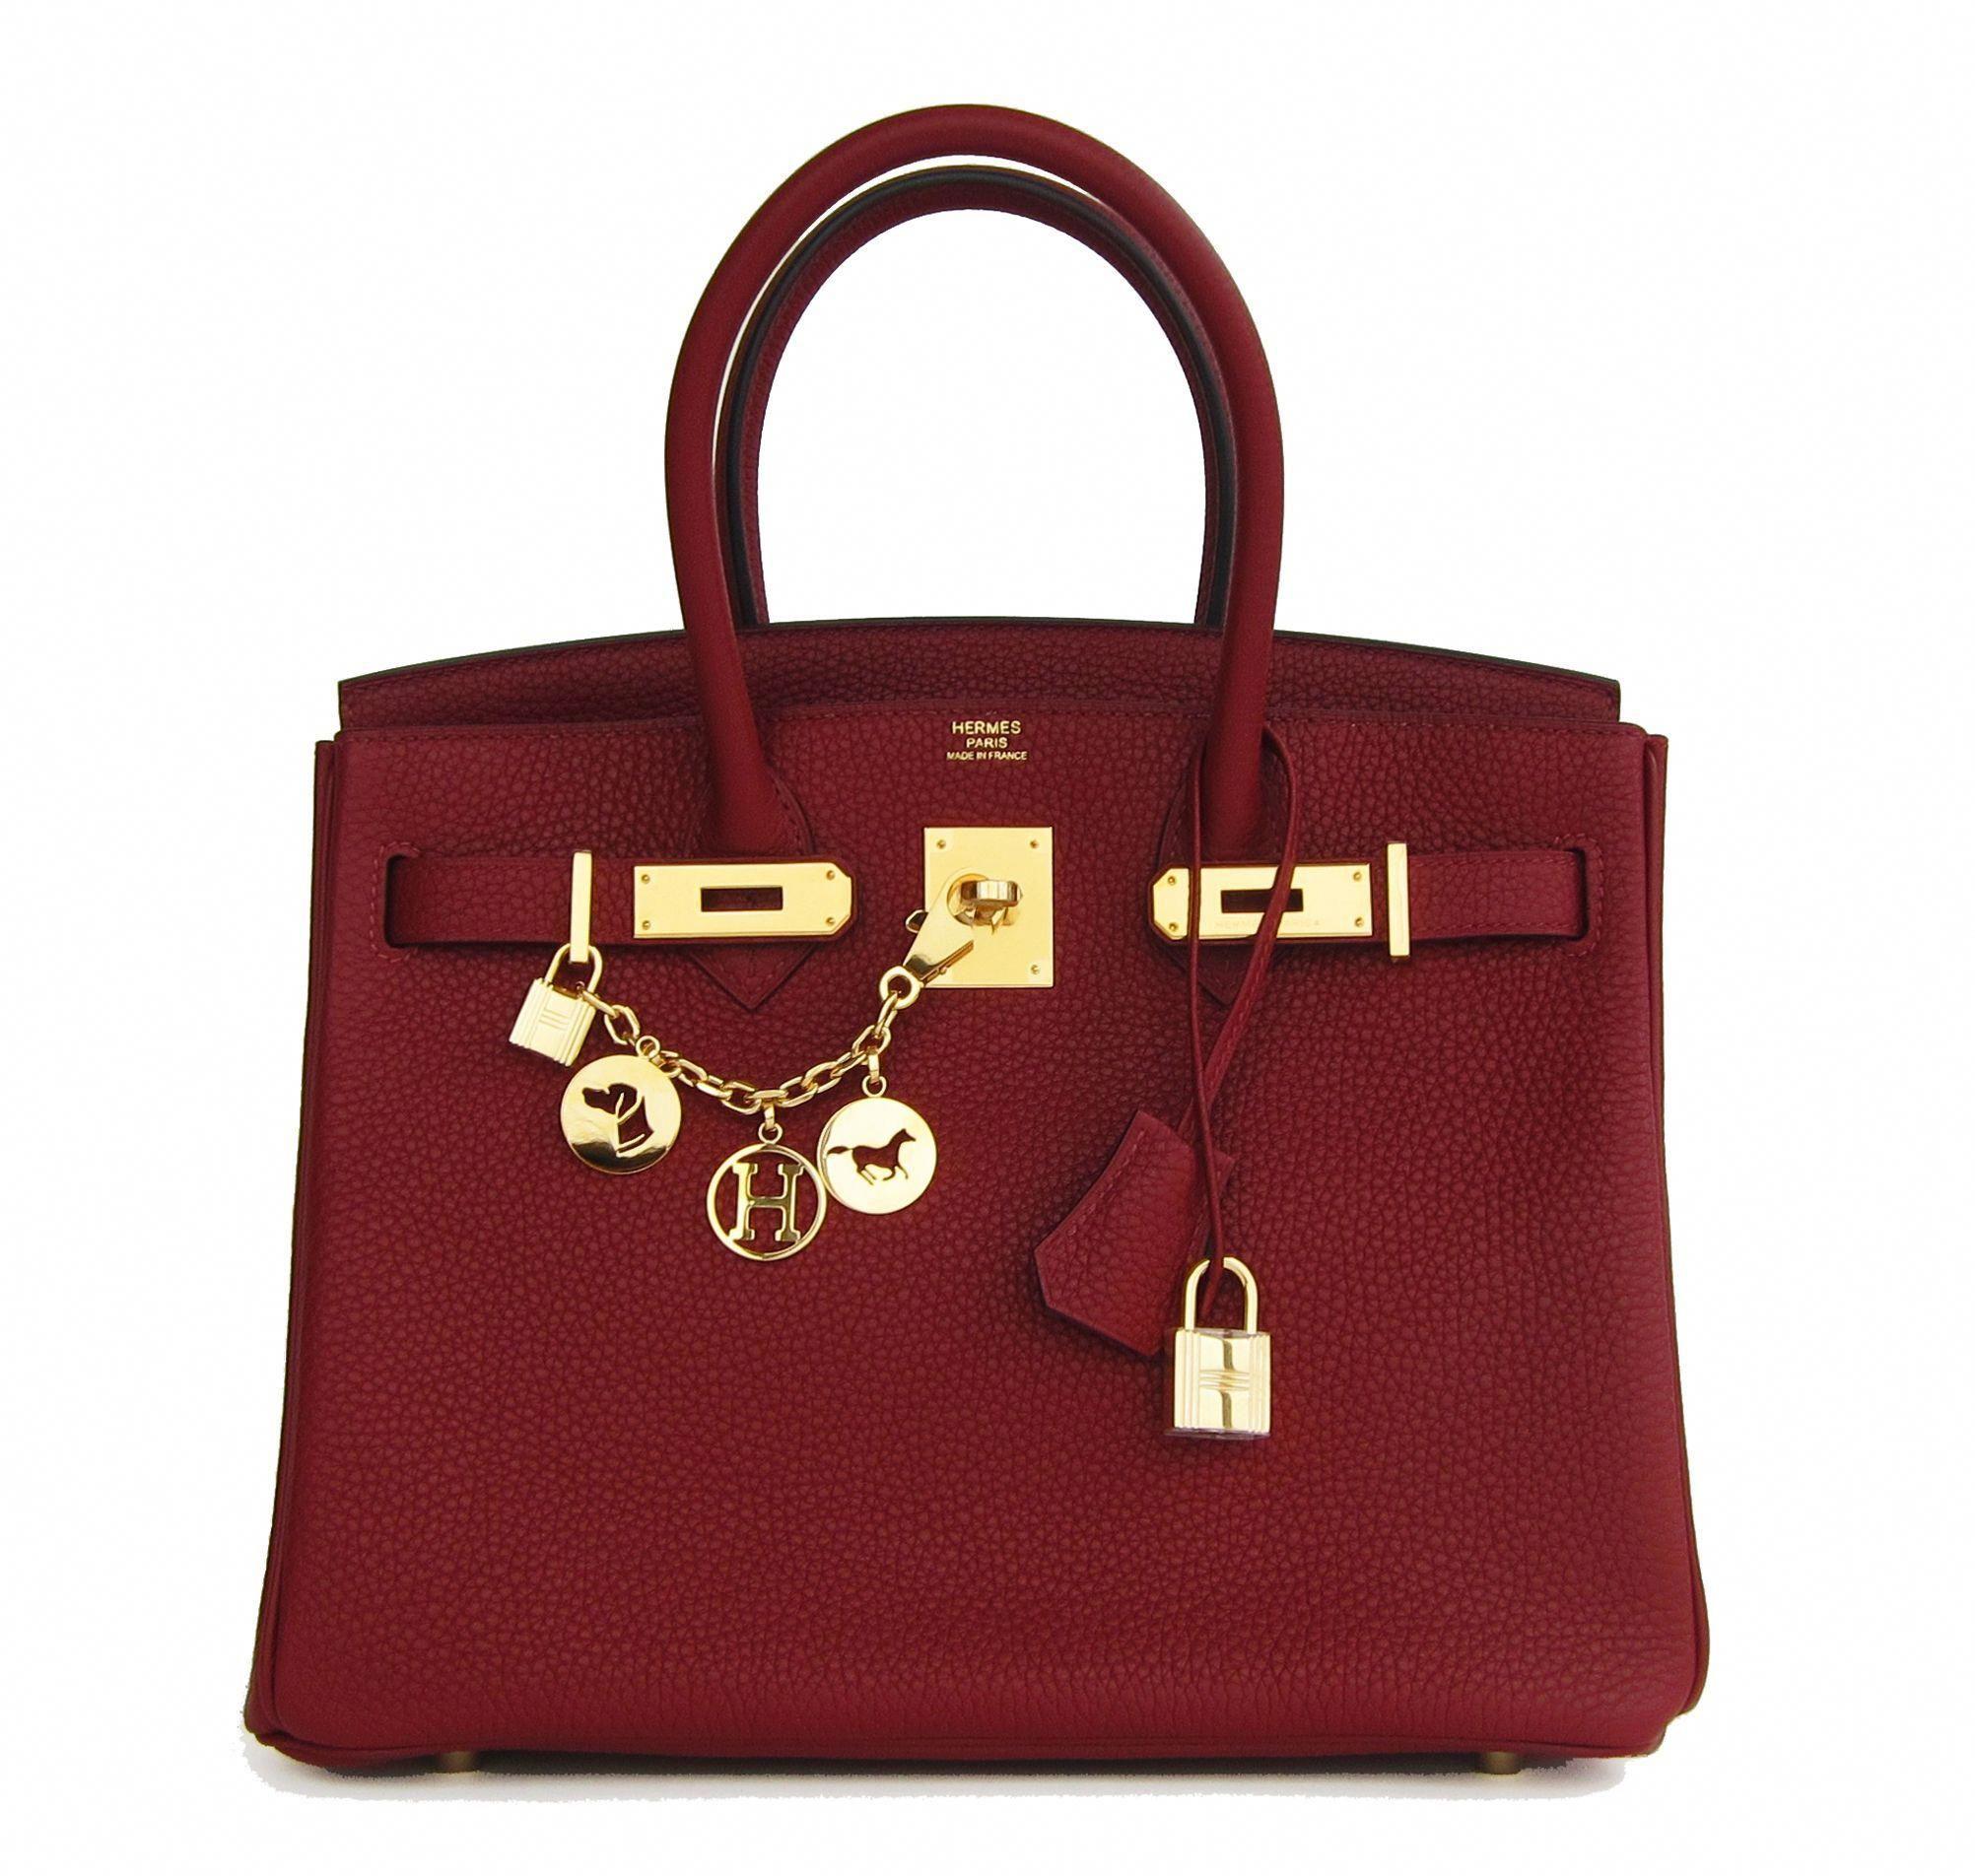 c3ee2c8f664b Hermes Birkin Bag Rouge H 30cm Clemence Gold Hardware  hermes  luxurybags   Designerhandbags